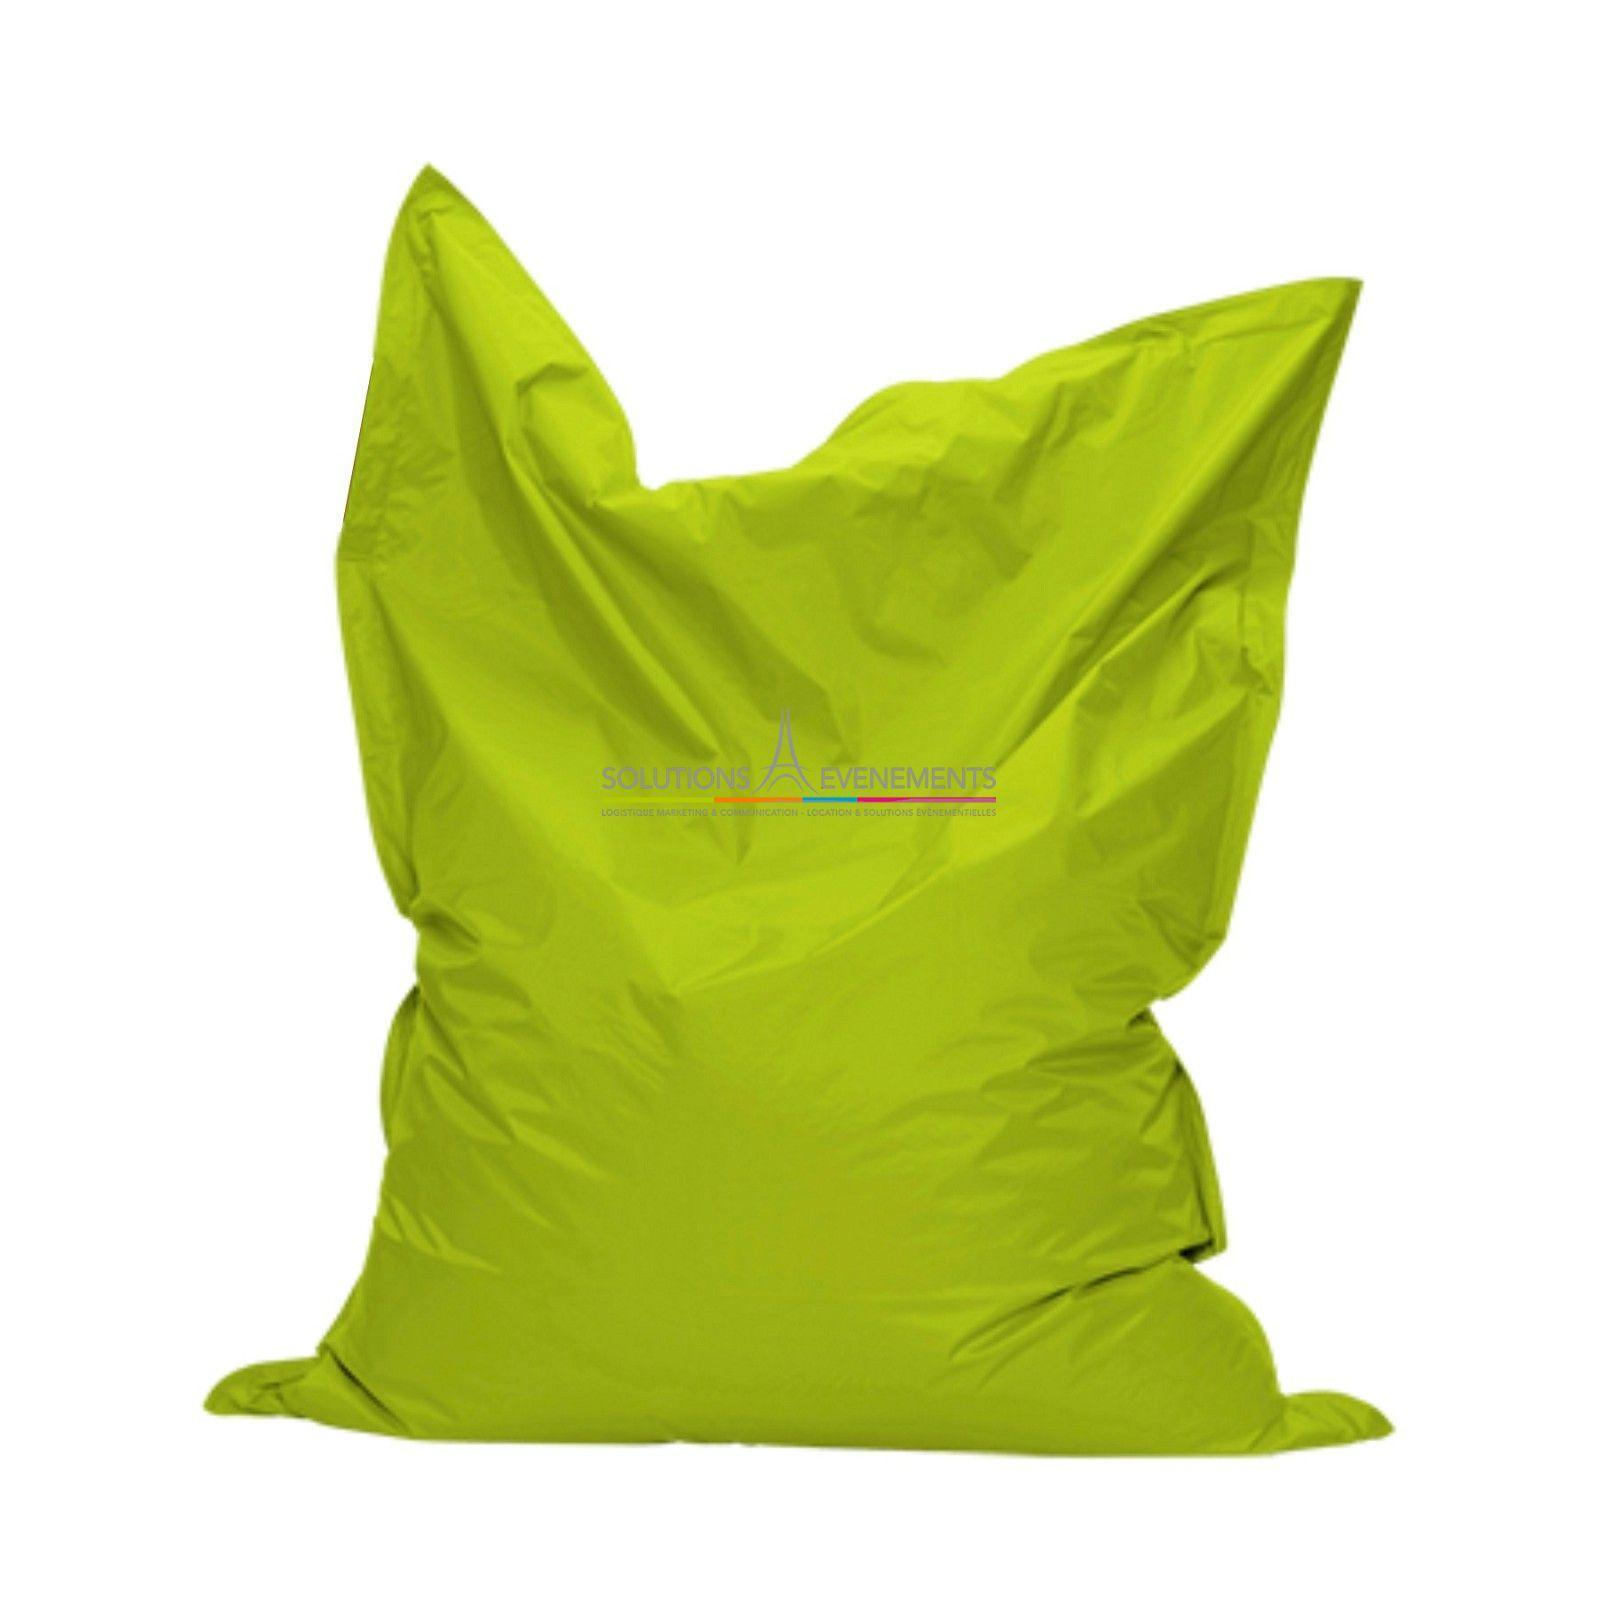 location pouf geant sac de billes fatboy. Black Bedroom Furniture Sets. Home Design Ideas